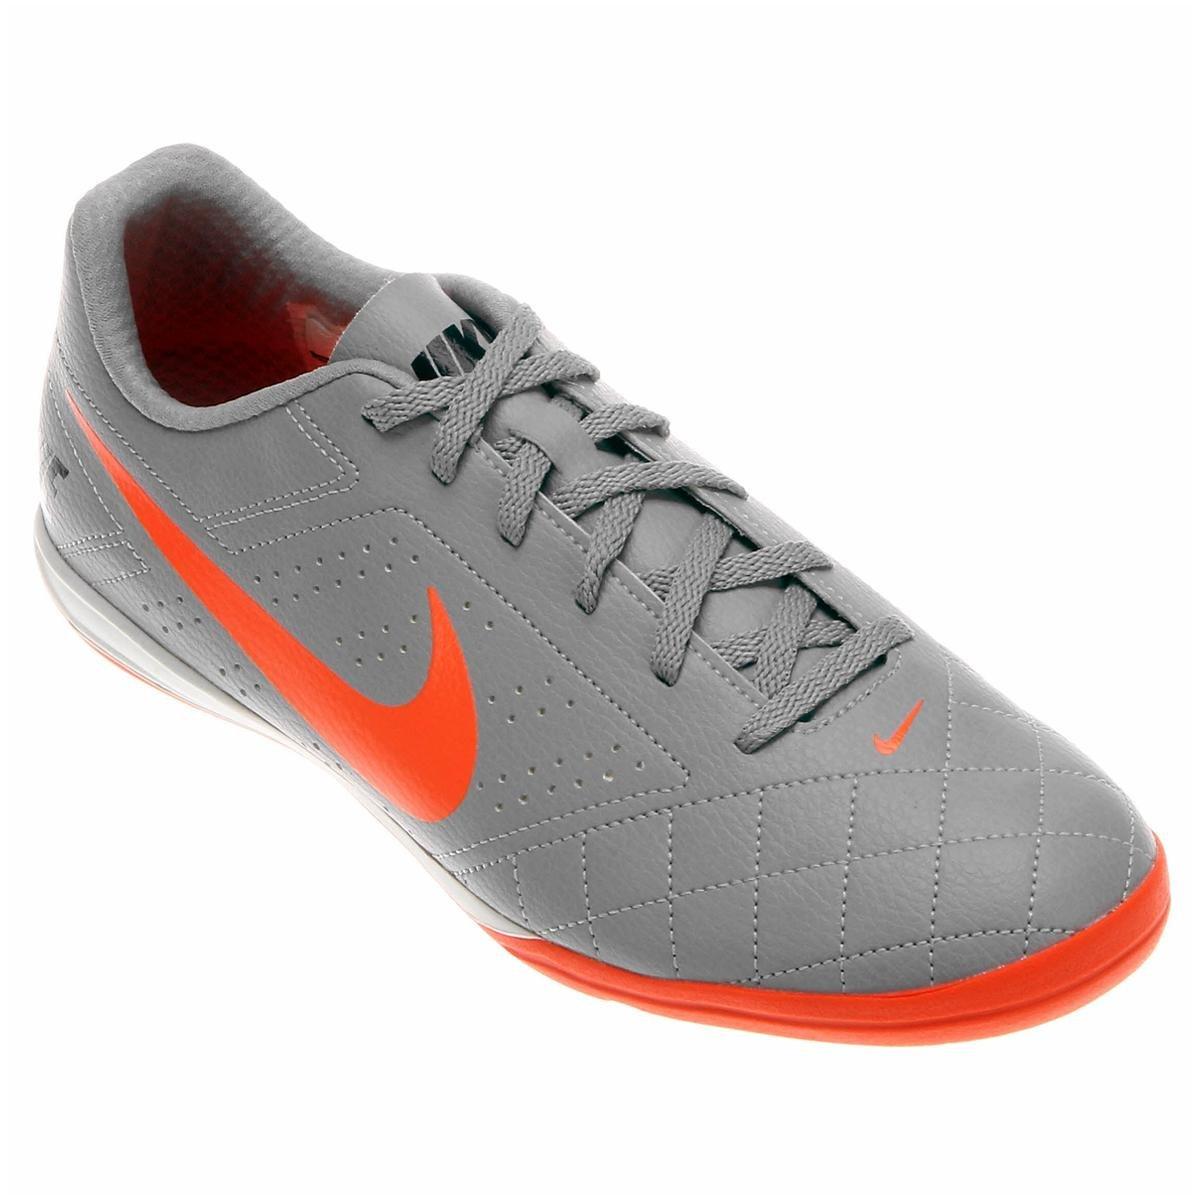 8a2bb3c6e6 Chuteira Futsal Nike Beco 2 Futsal - Cinza e Laranja - Compre Agora ...